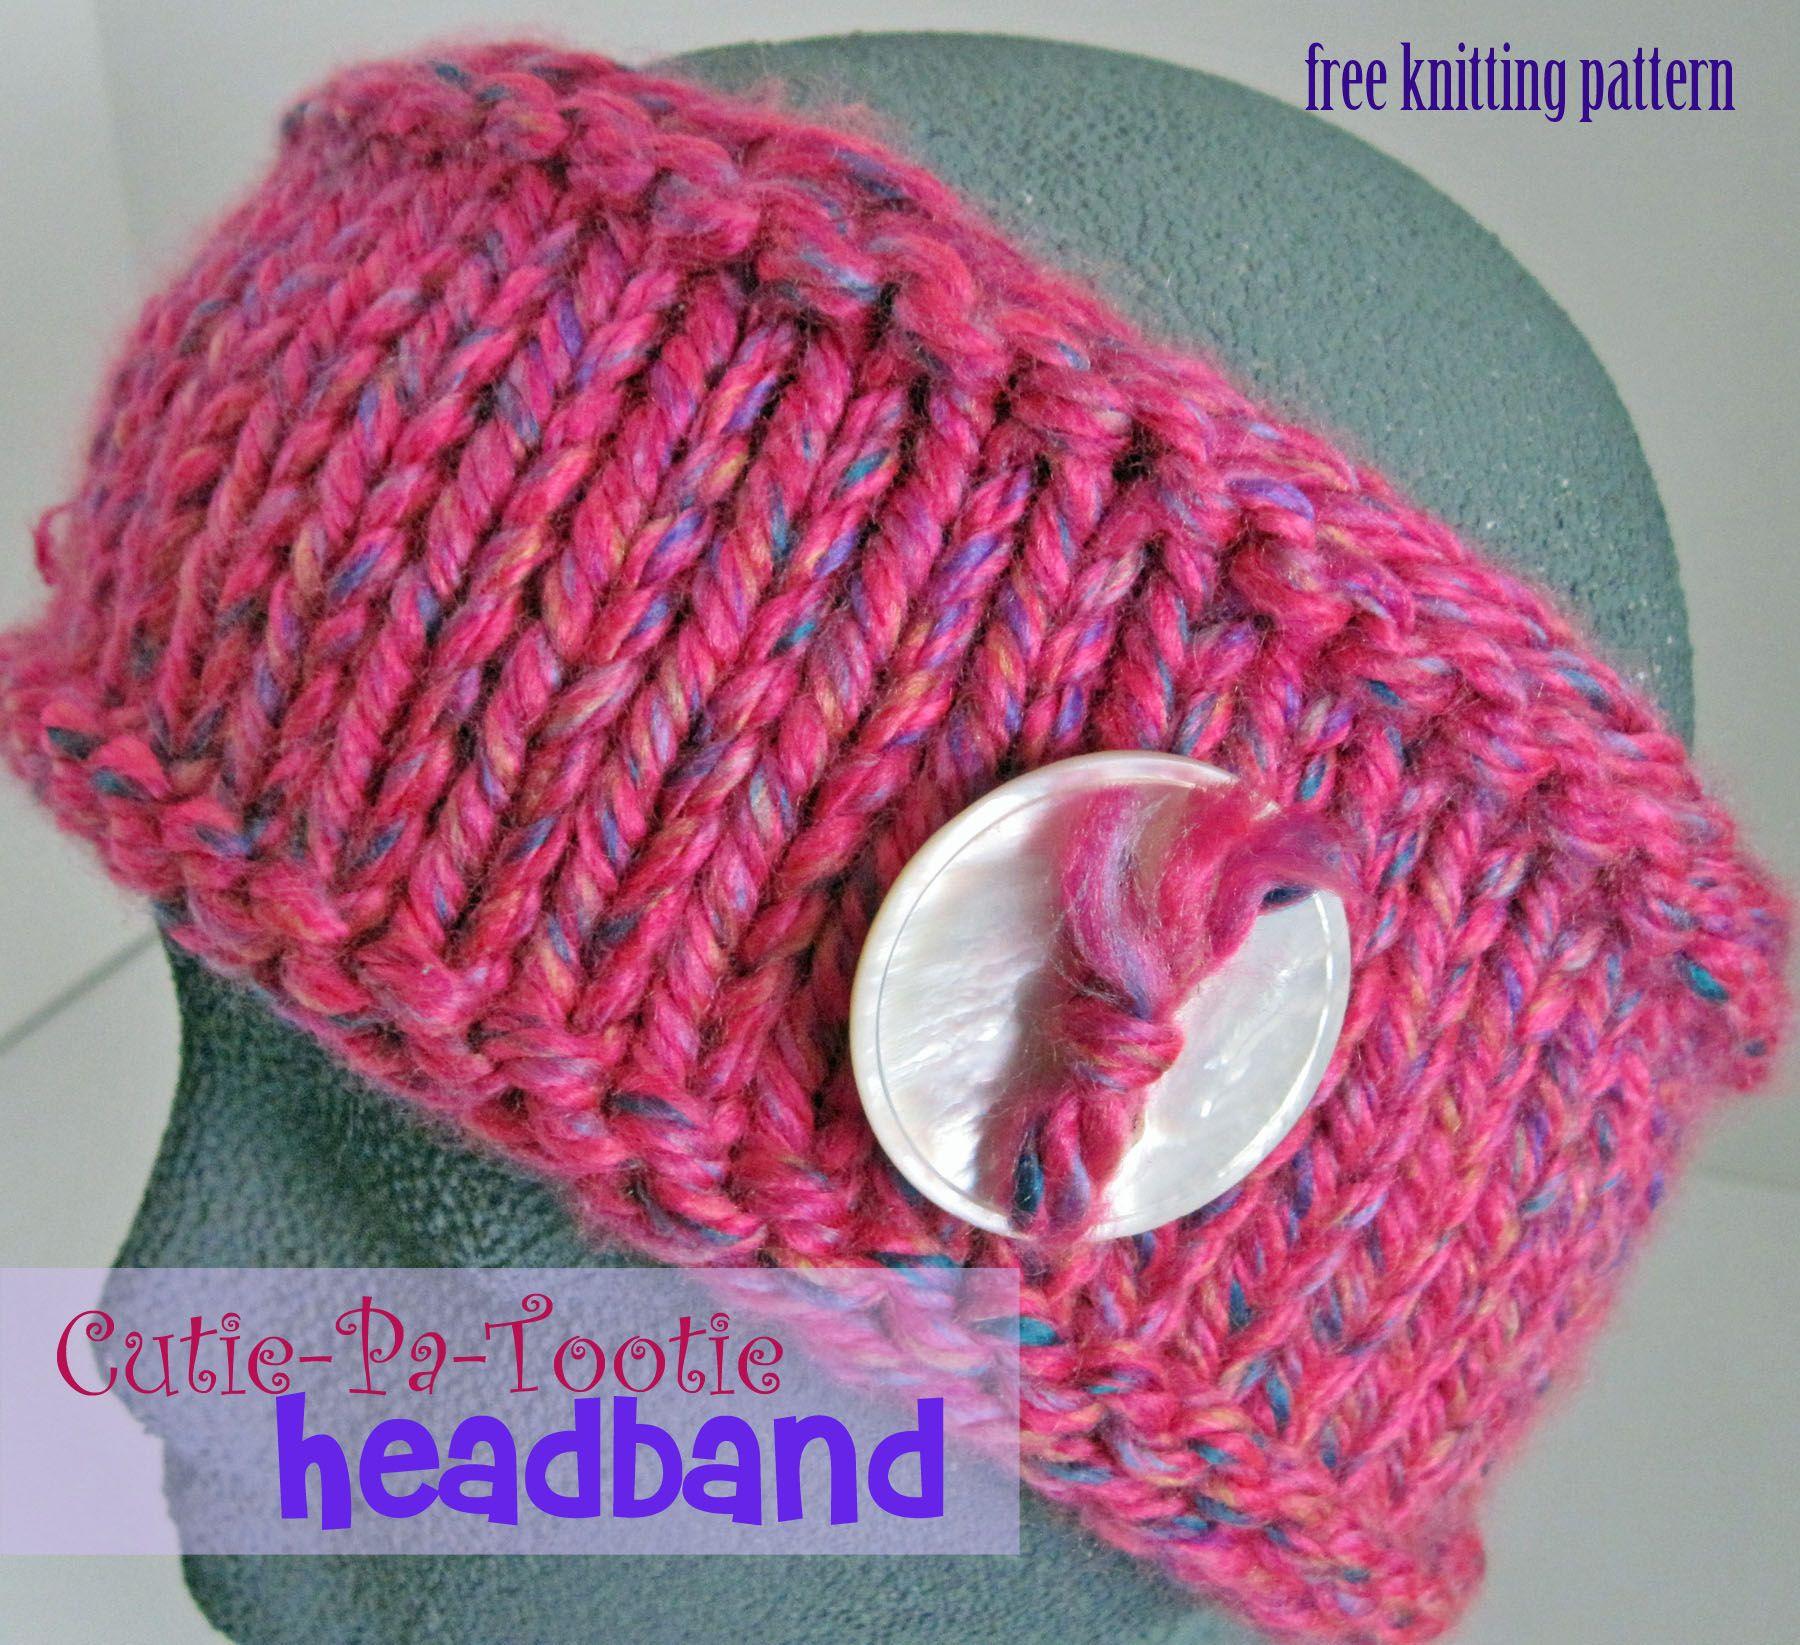 Cutie Patootie Headband: free knitting pattern from Craftown ...